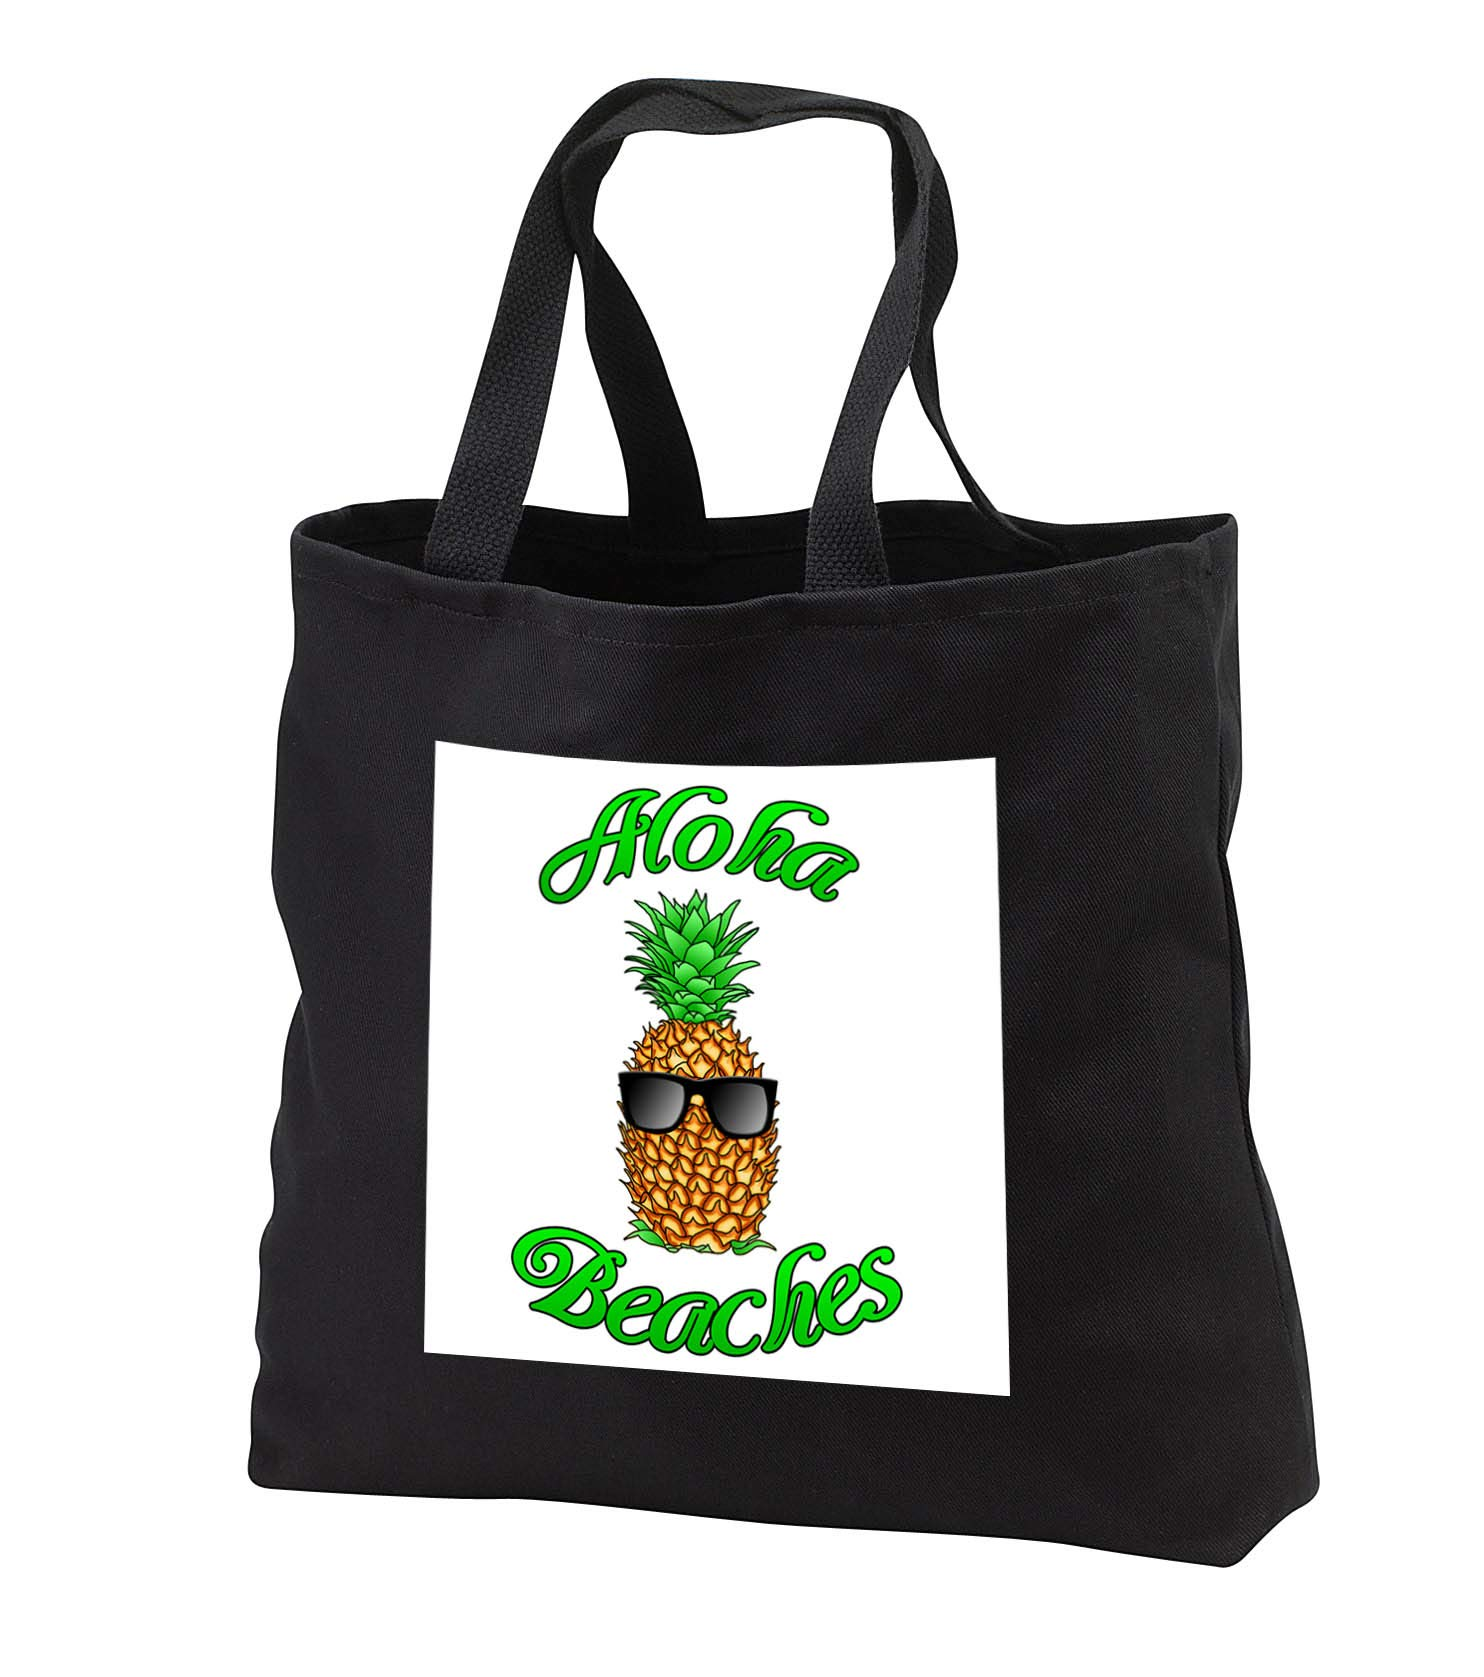 MacDonald Creative Studios - Hawaii - Funny Aloha Beaches with a cool tropical pineapple in sunglasses. - Tote Bags - Black Tote Bag 14w x 14h x 3d (tb_291825_1)